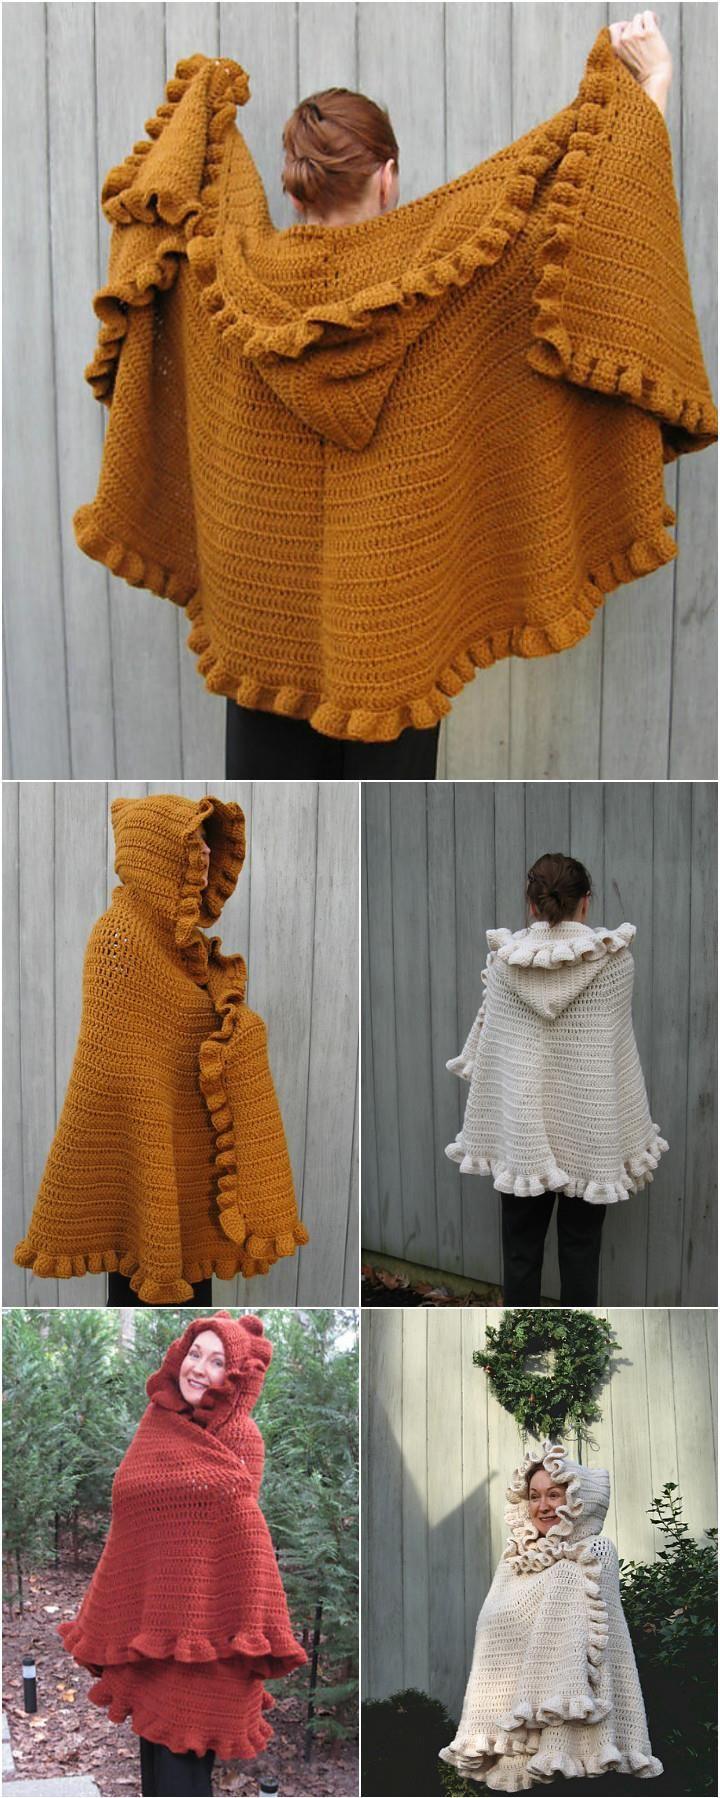 Crochet Ruffled Shawl - 10 FREE Crochet Shawl Patterns for Women's | 101 Crochet